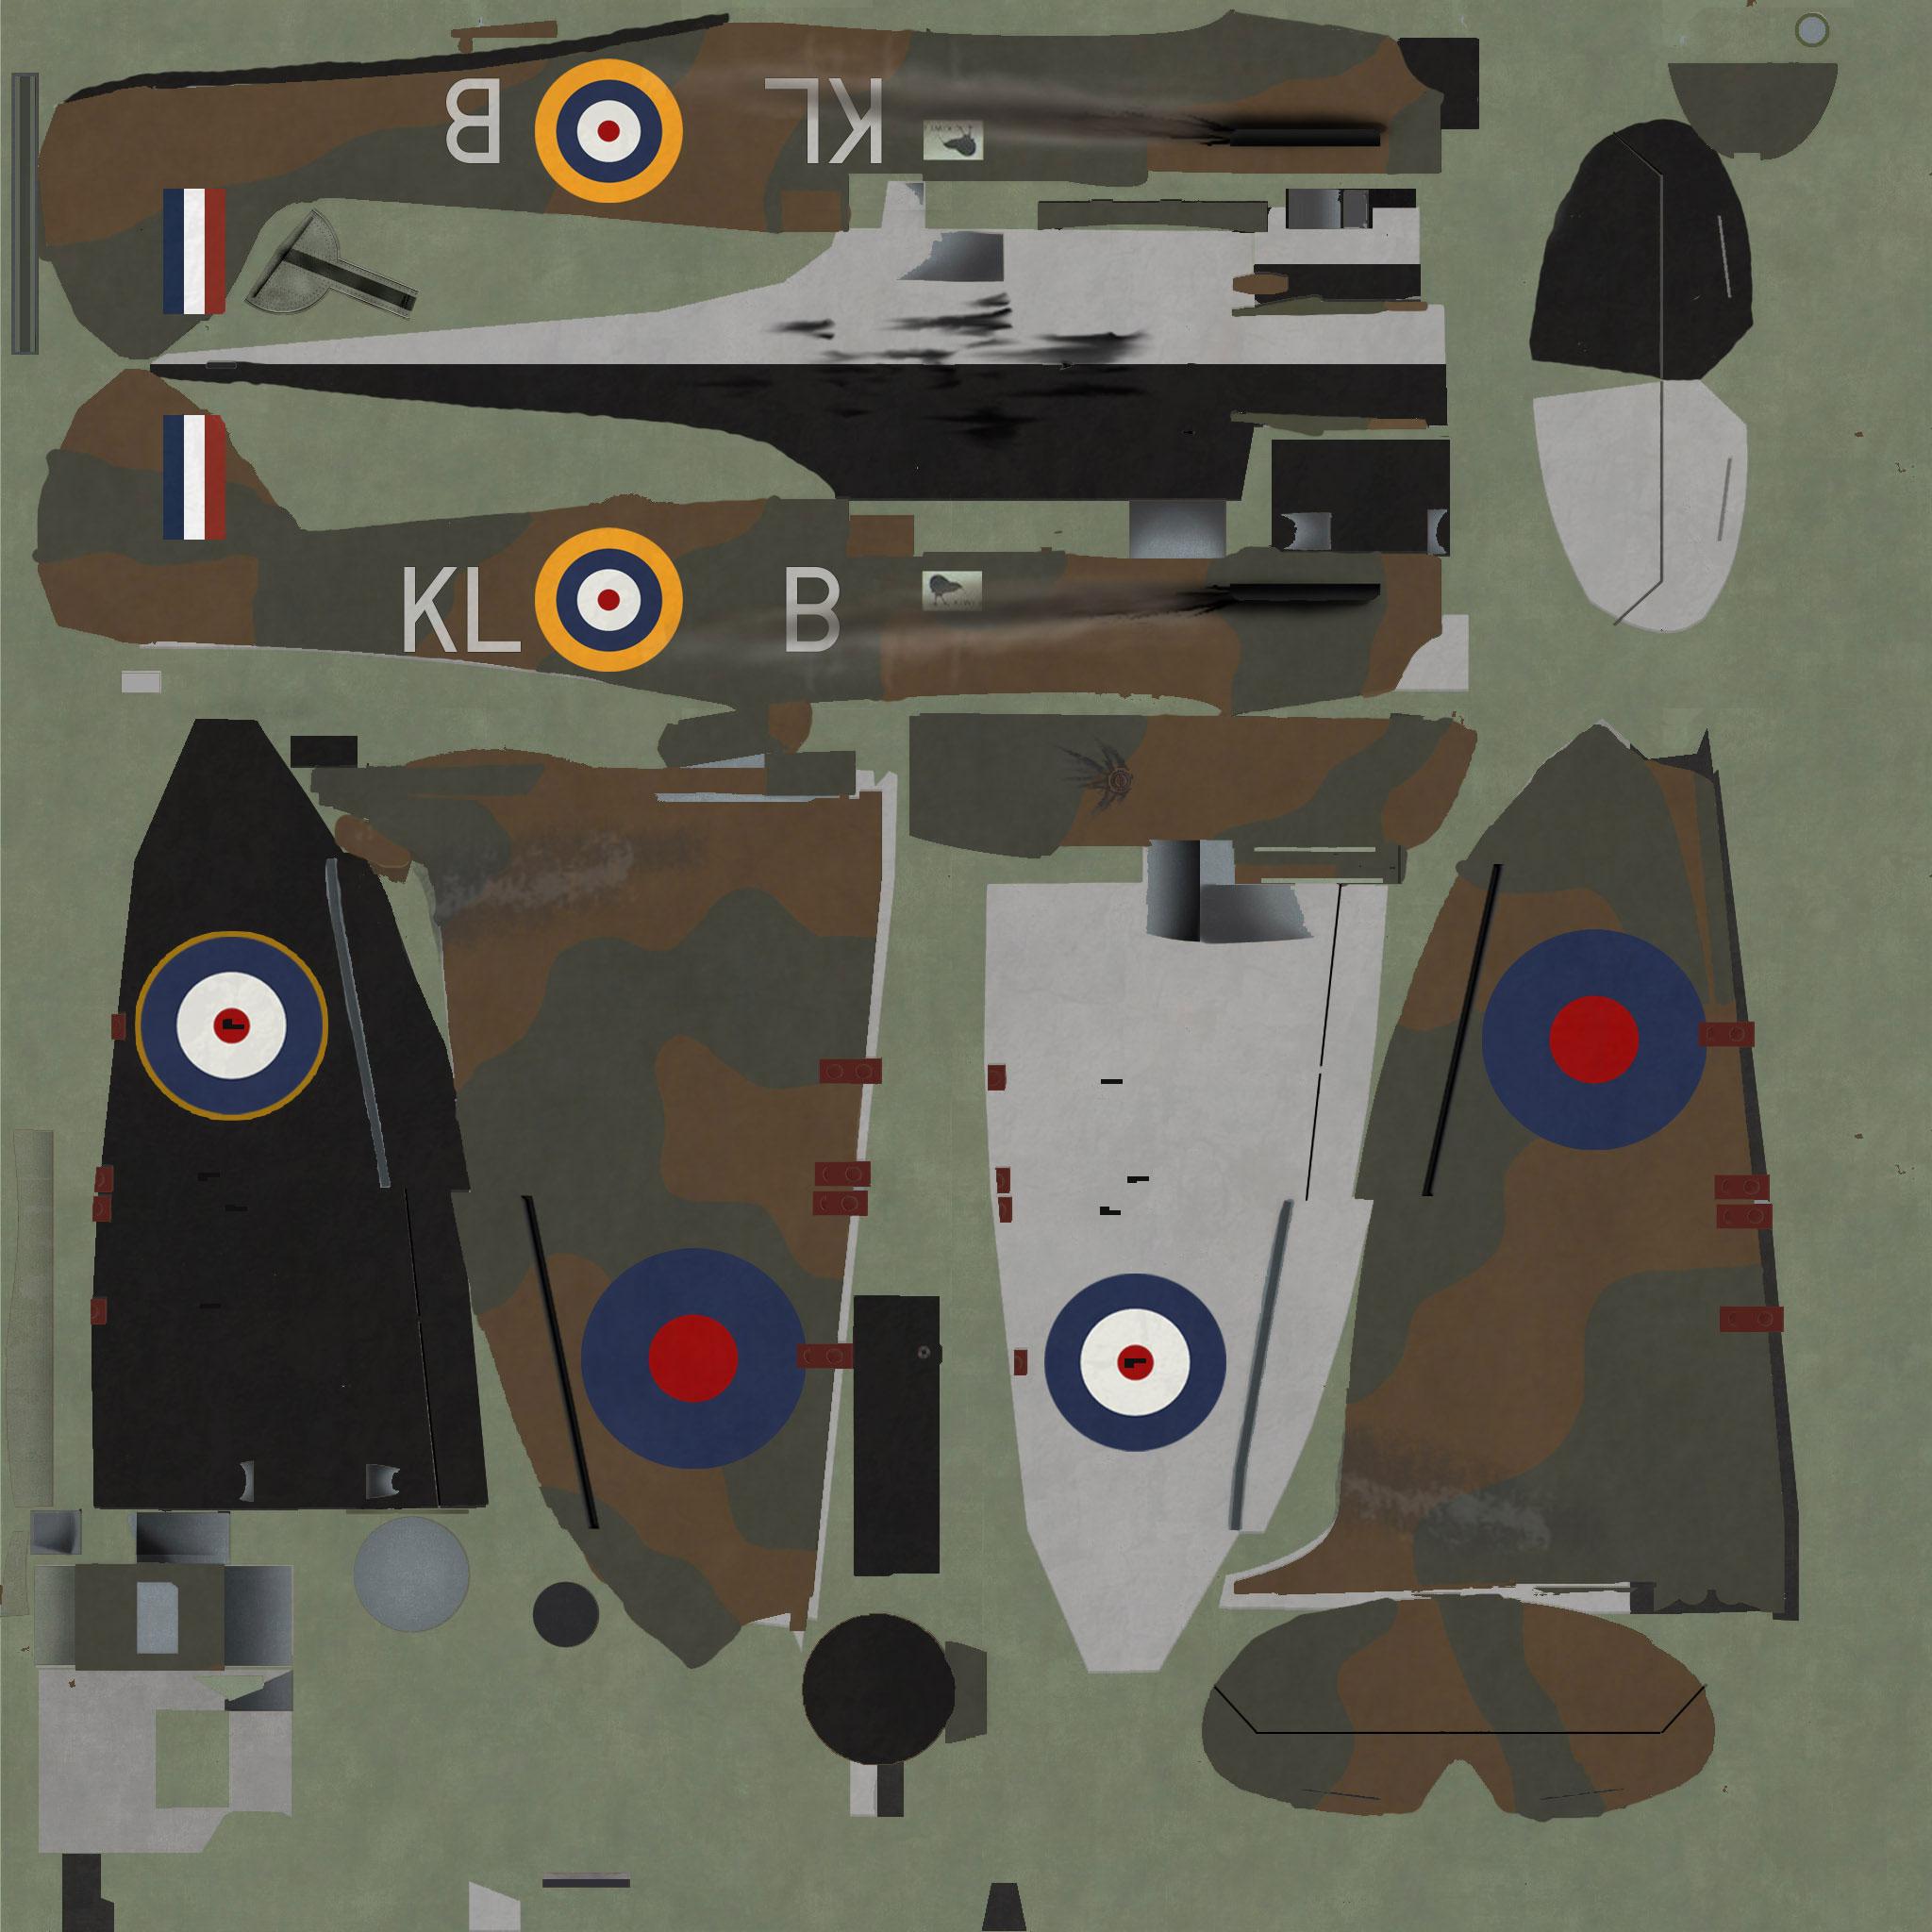 COD KF MkI RAF 54Sqn KLB Allan Deere N3183 Hornchurch 1940